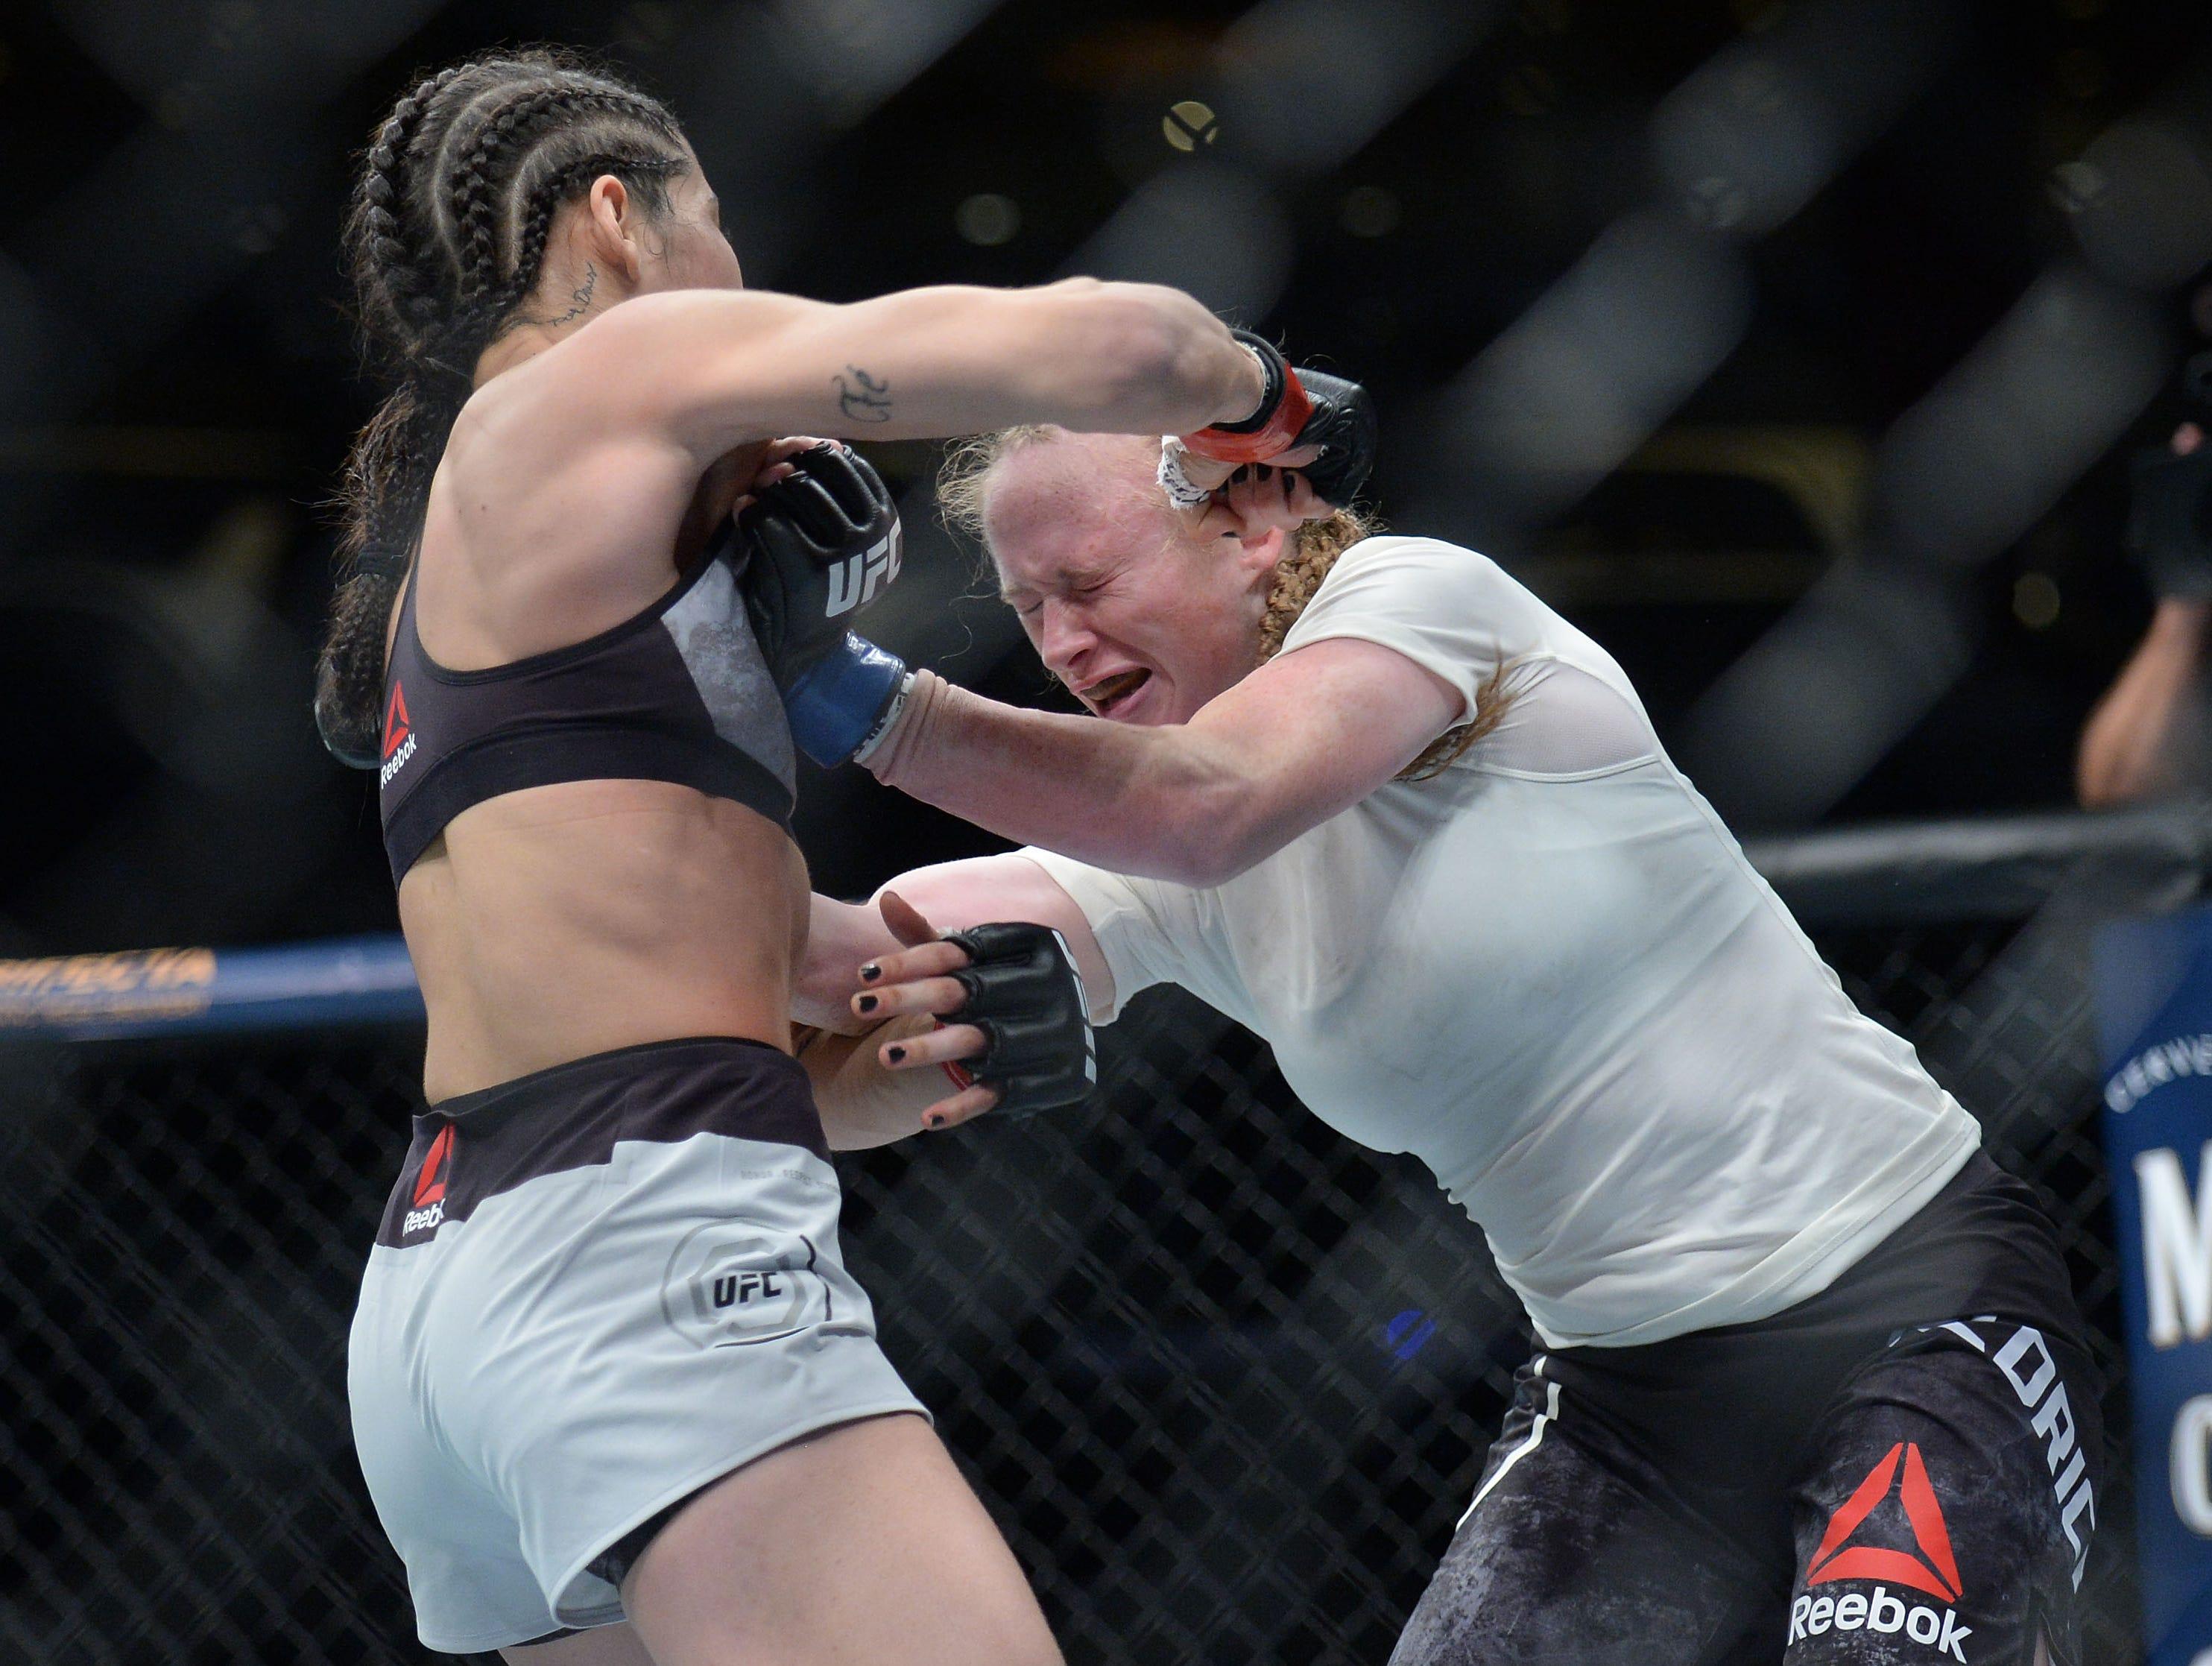 JJ Aldrich defends against Polyana Viana during UFC 227 at Staples Center.